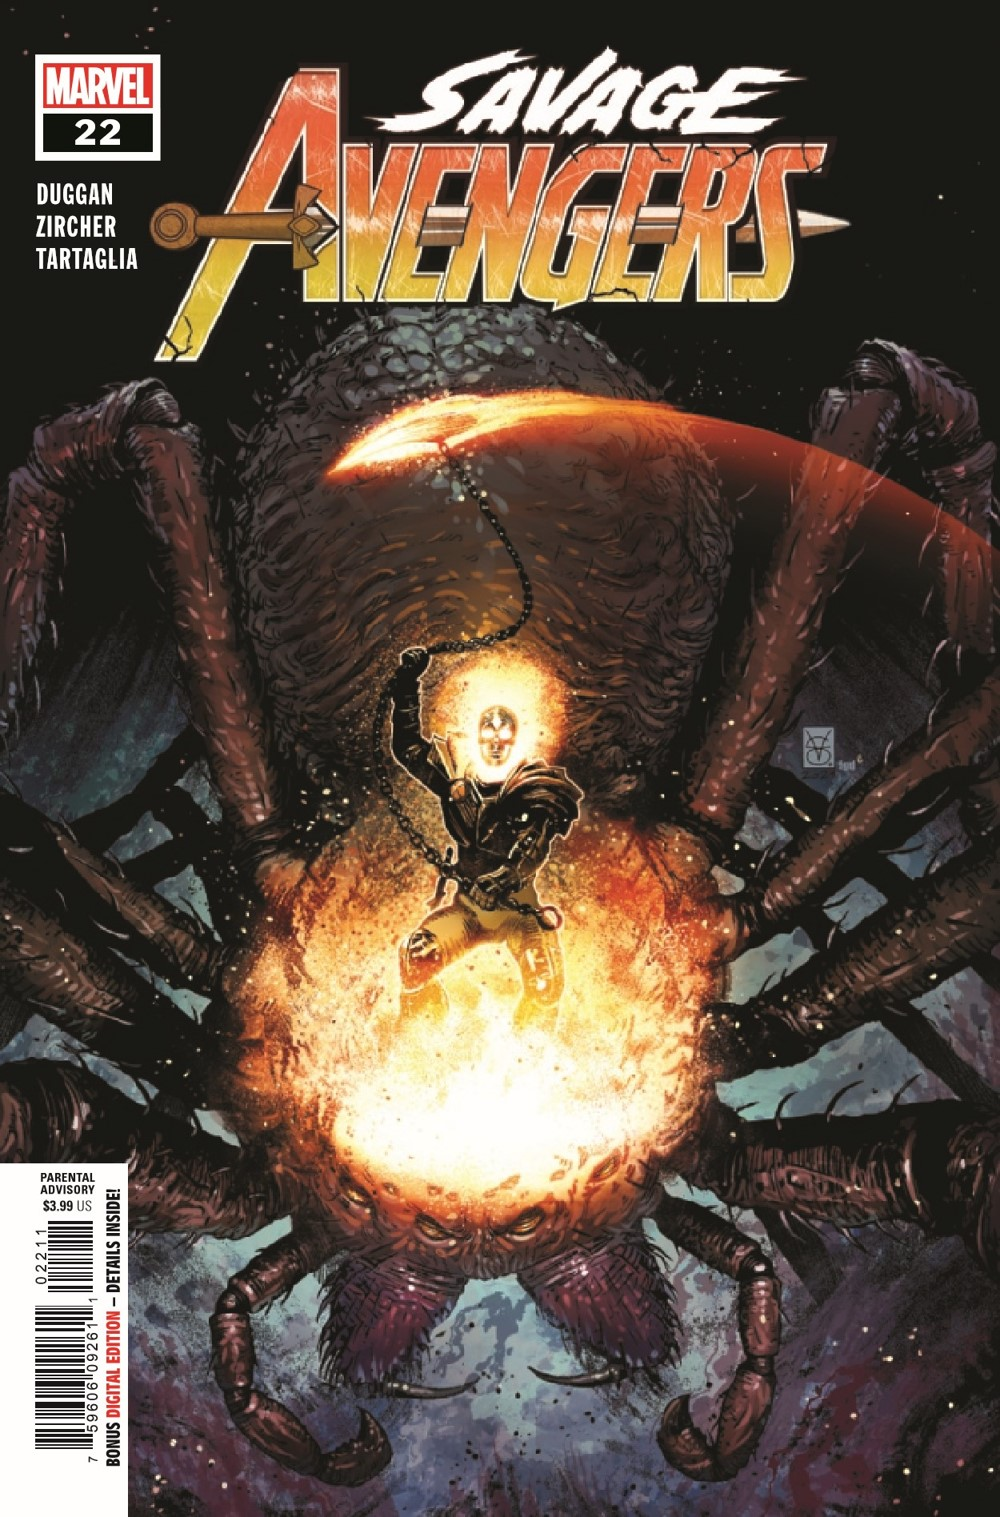 SAVAVEN2019022_Preview-1 ComicList Previews: SAVAGE AVENGERS #22